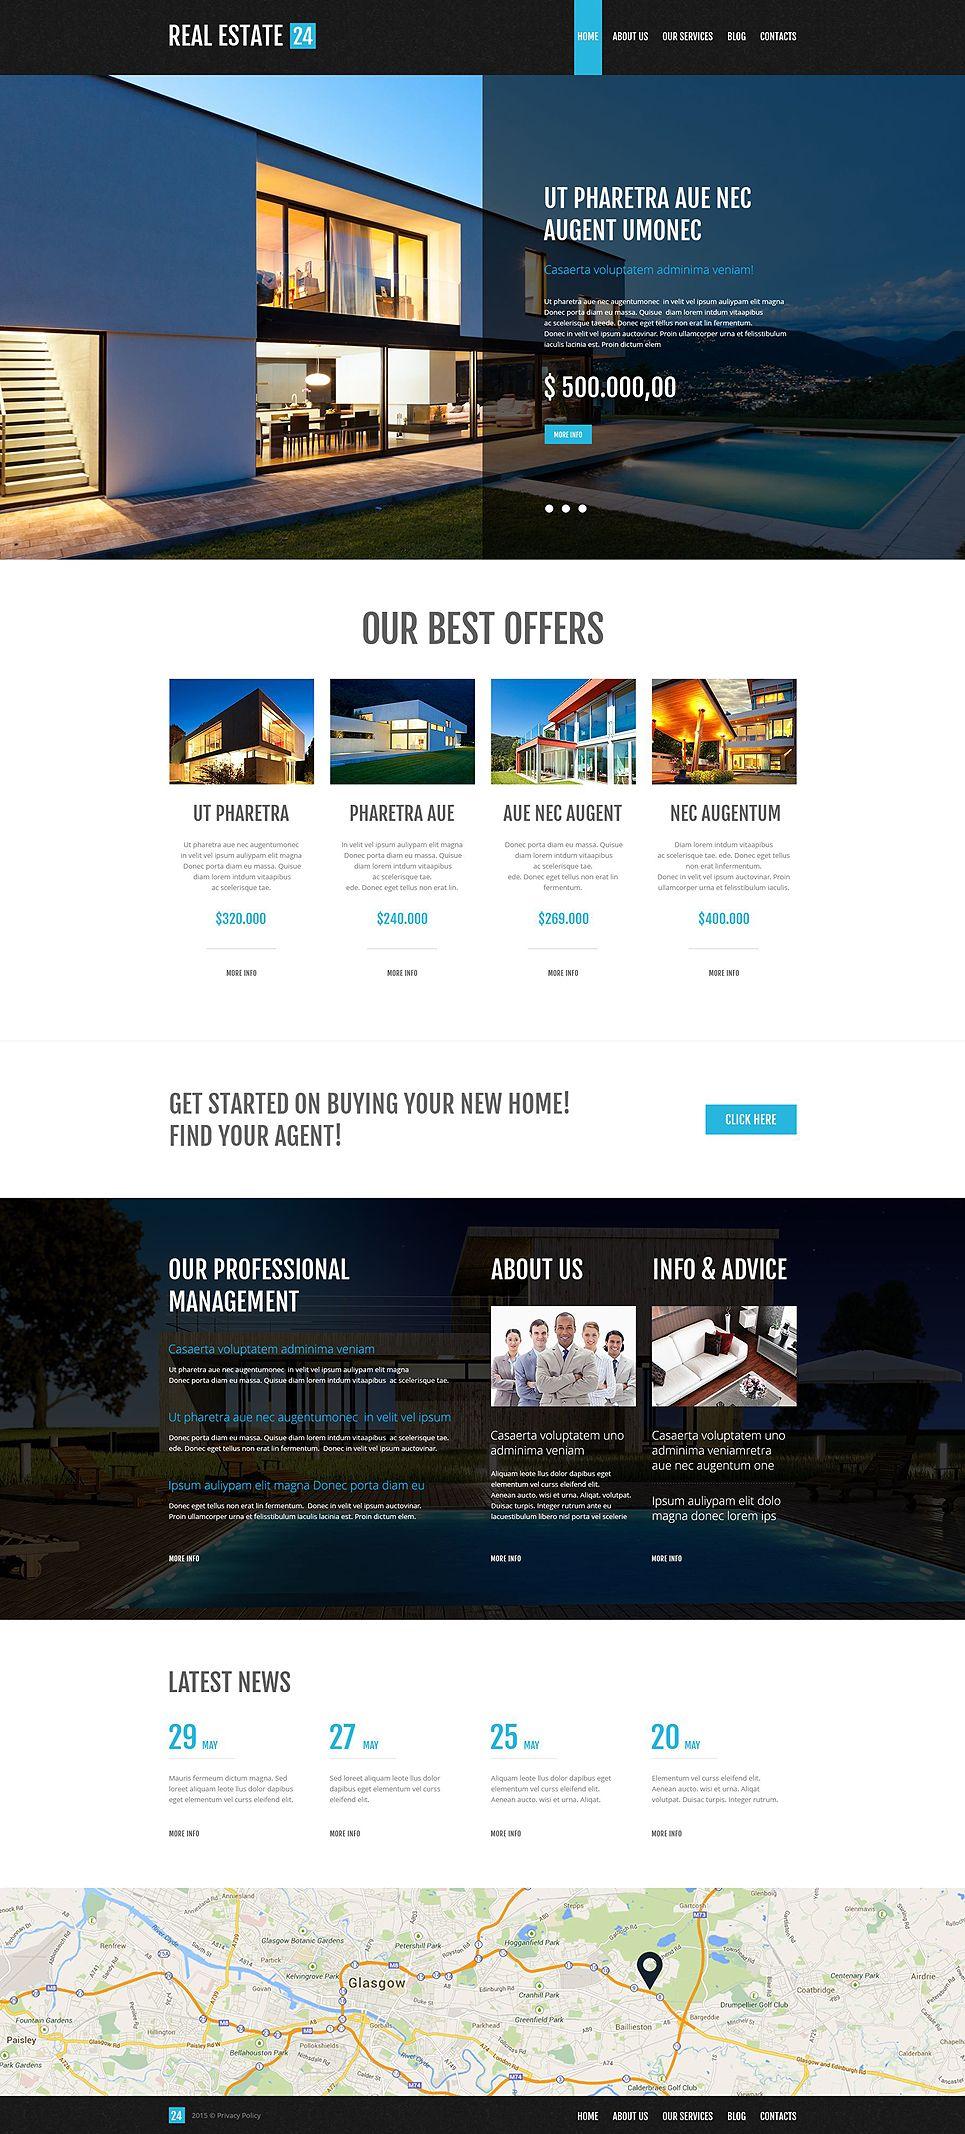 Realtor Company Wordpress Theme Real Estate Website Design Real Estate Web Design Real Estate